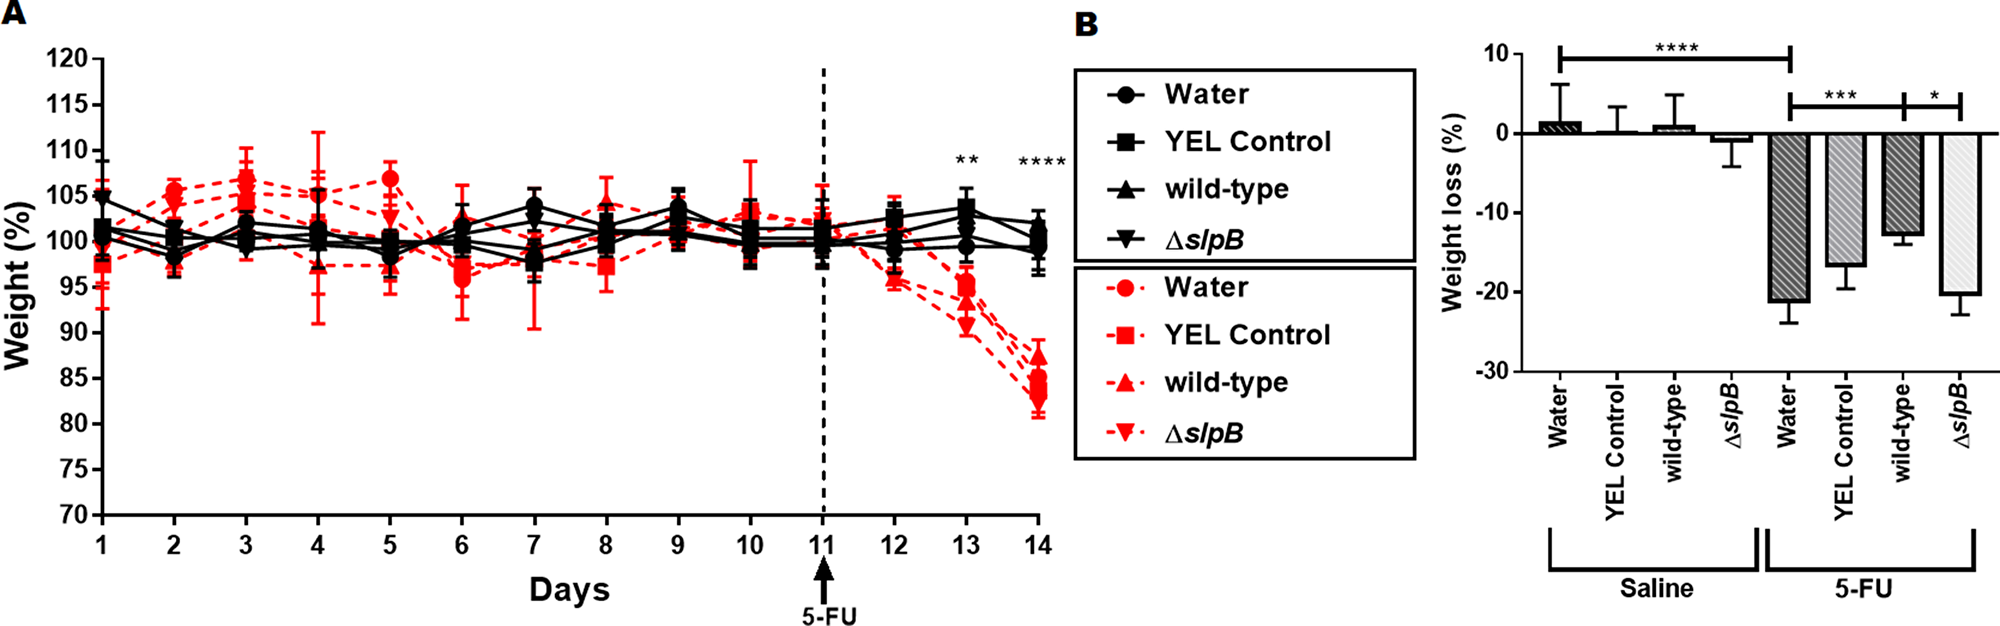 Propionibacterium freudenreichii WT strain prevents weight loss in 5-FU-treated mice.